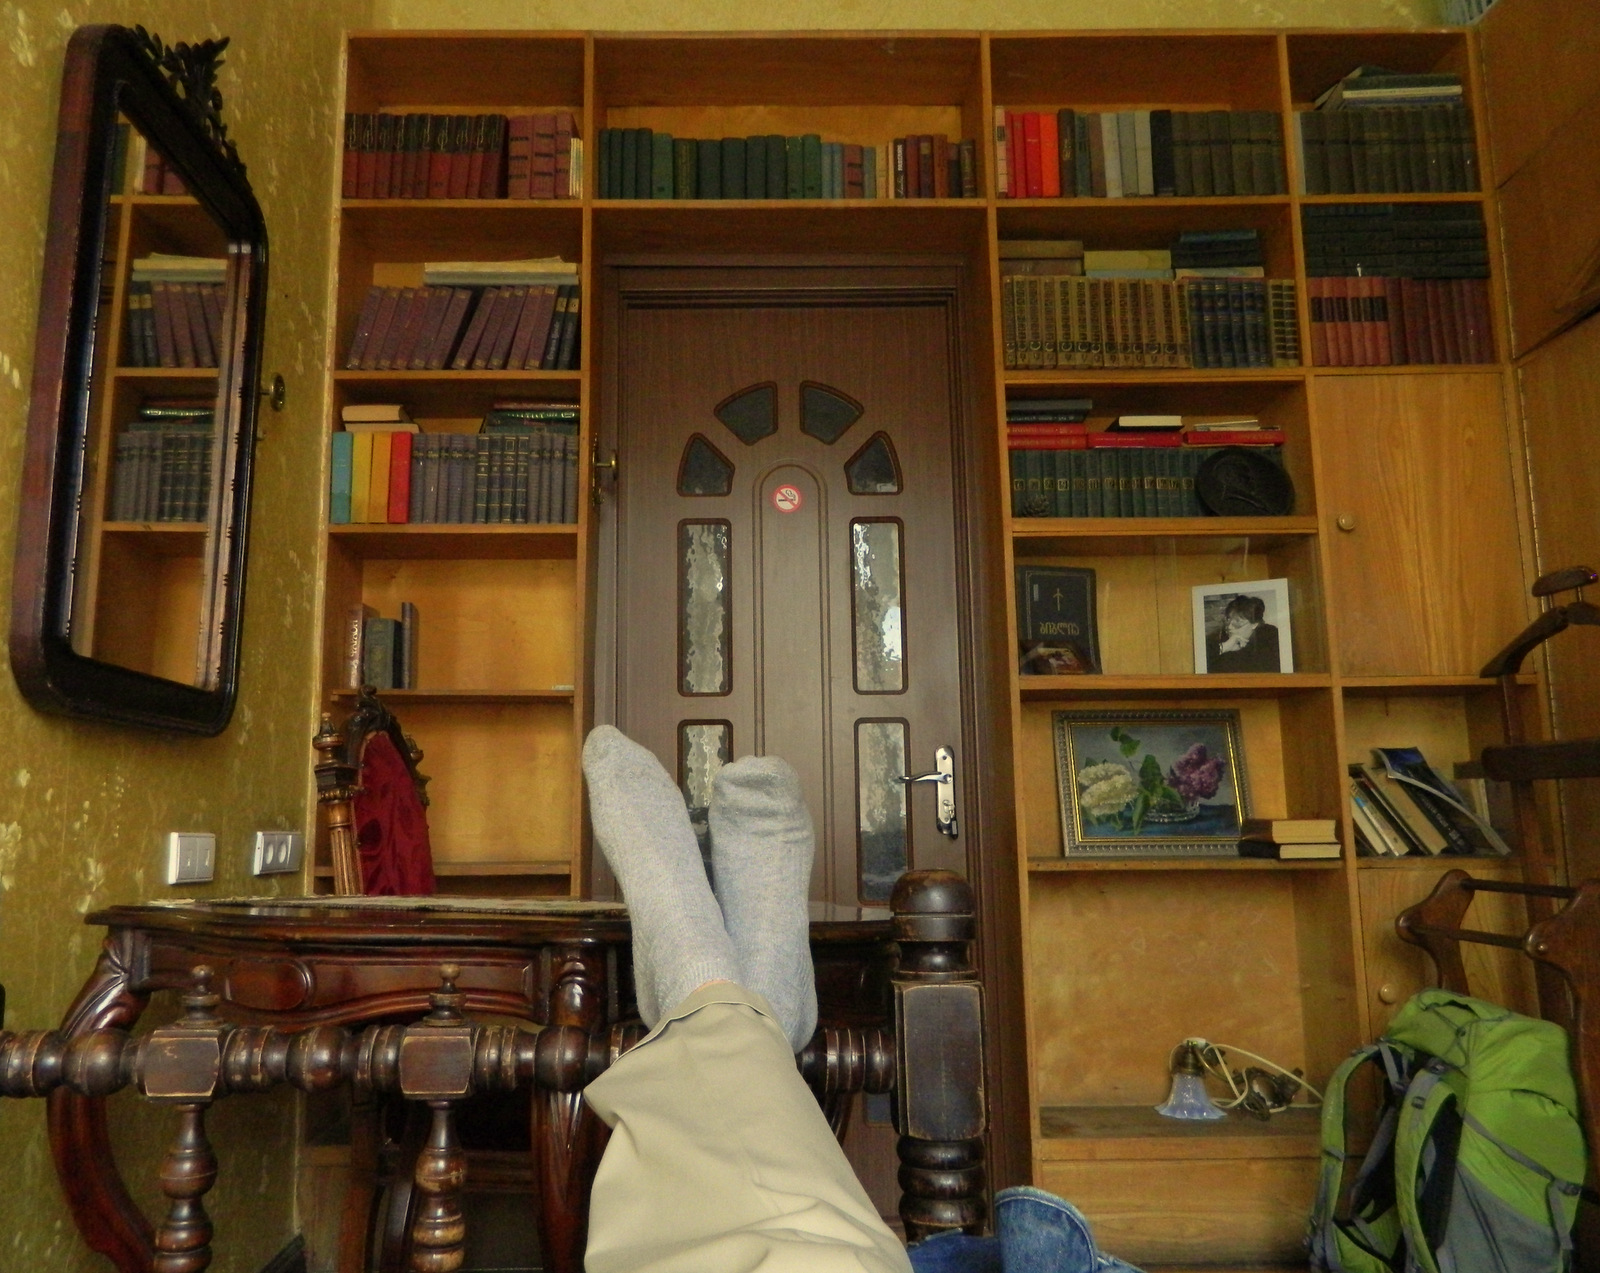 Hostel Bibliothek.JPG